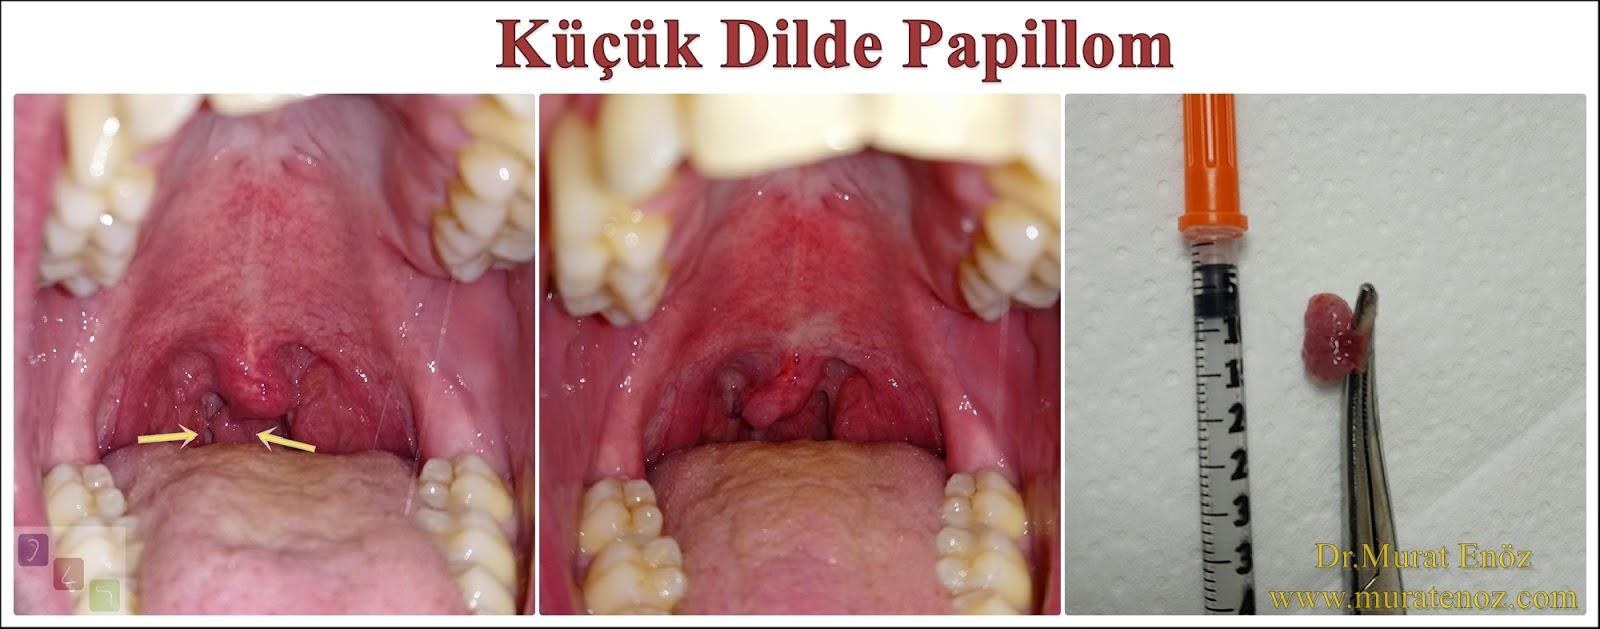 Hpv papilloma uvula Infecția cu HPV la bărbat | ARAS – Asociatia Romana Anti-SIDA Paviloma uvula